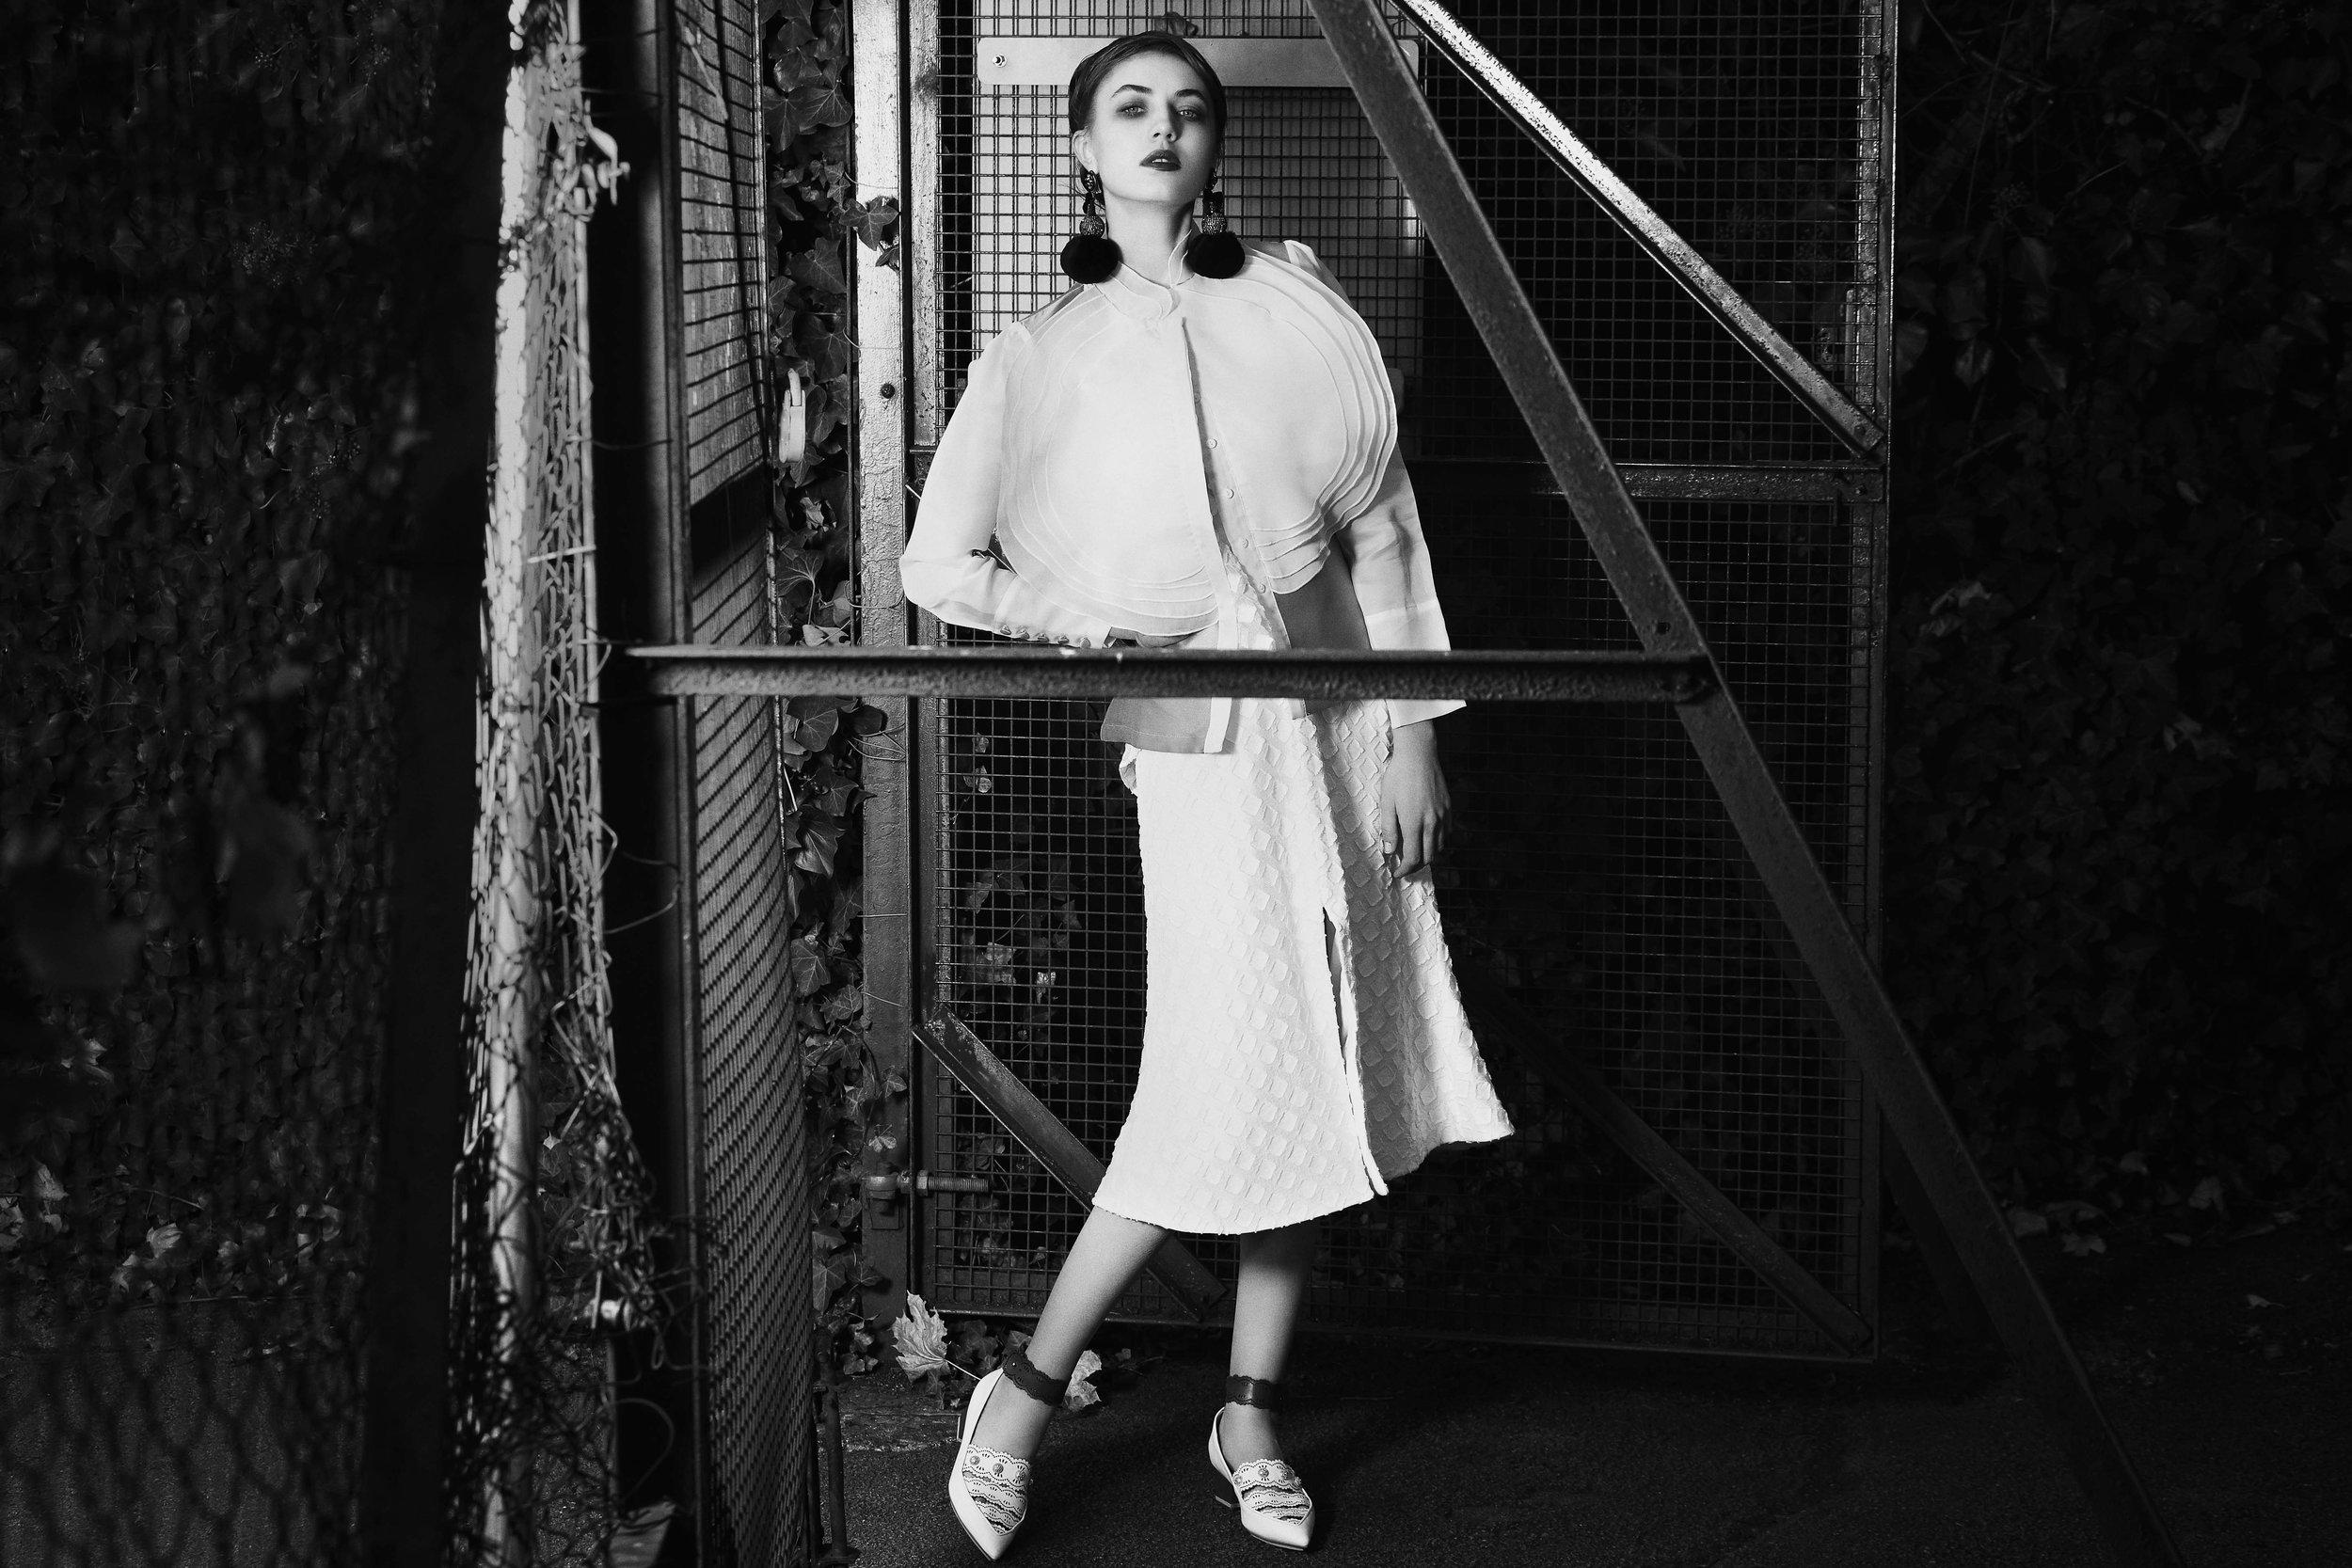 Dress : C/MEO COLLECTIVE Shirt : CATRIONA HANLY (Felicities PR)  Earring : RANJANA KHAN Ring : LINNIE MCLARTY Footwear : RUE ST.